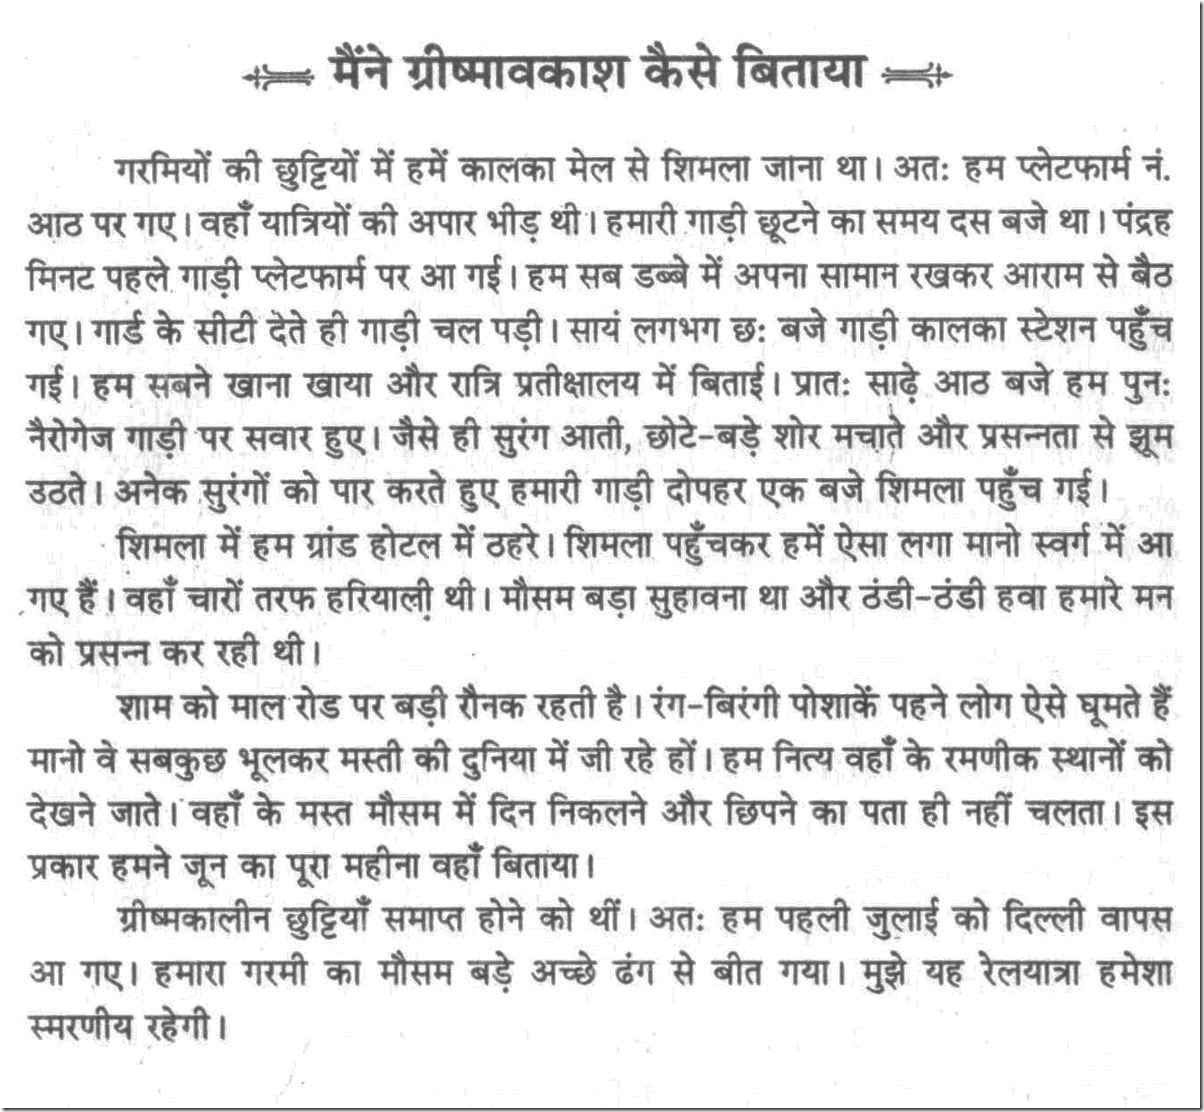 005 Summer Vacation Essay 1000135 Thumb Frightening For Class 6 In Urdu On Marathi Full